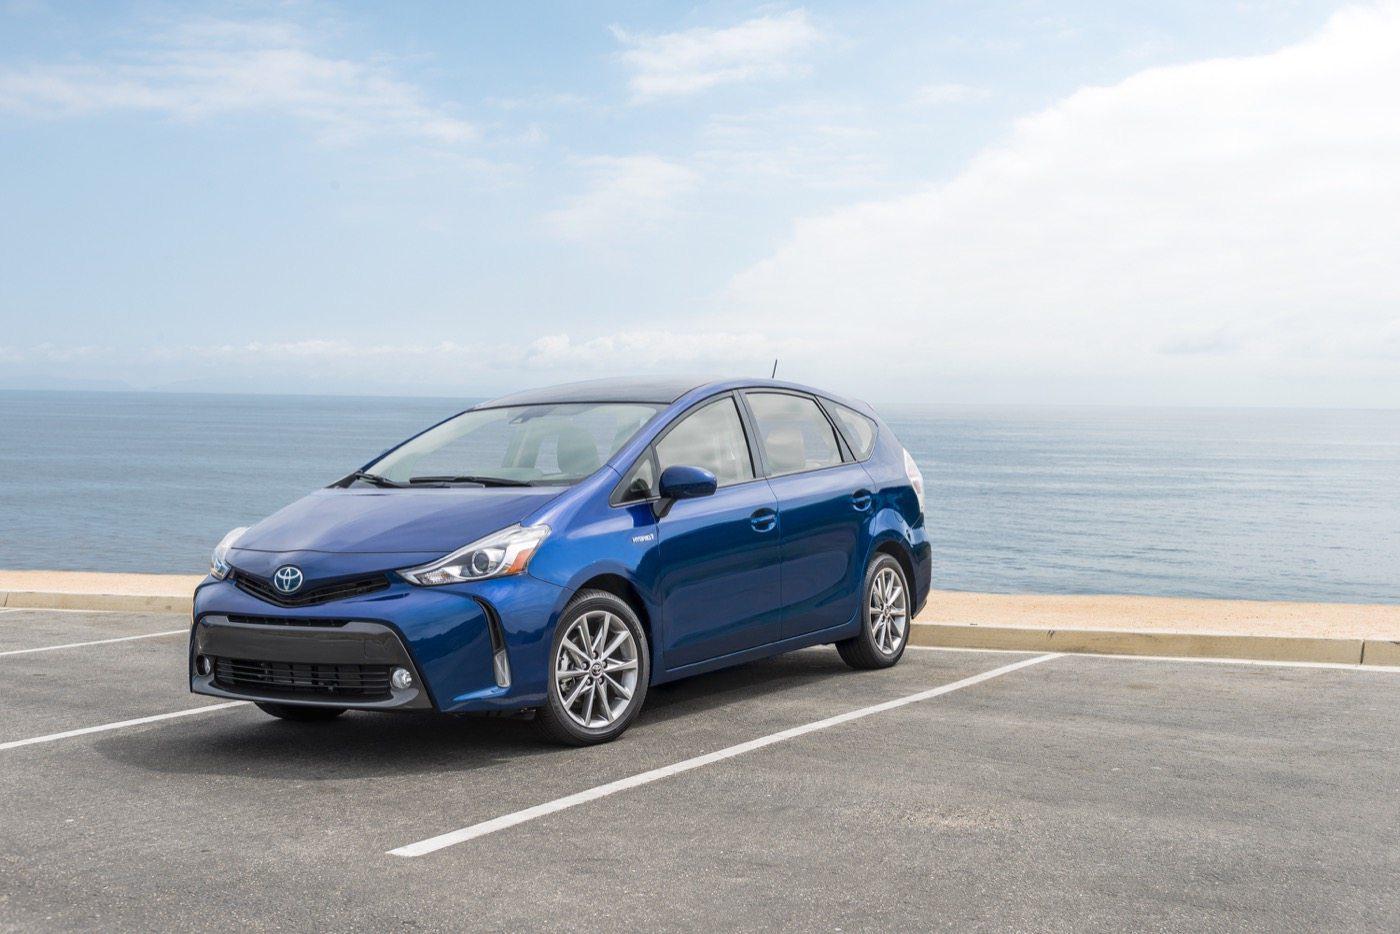 2016 Toyota Prius V - Image: Toyota